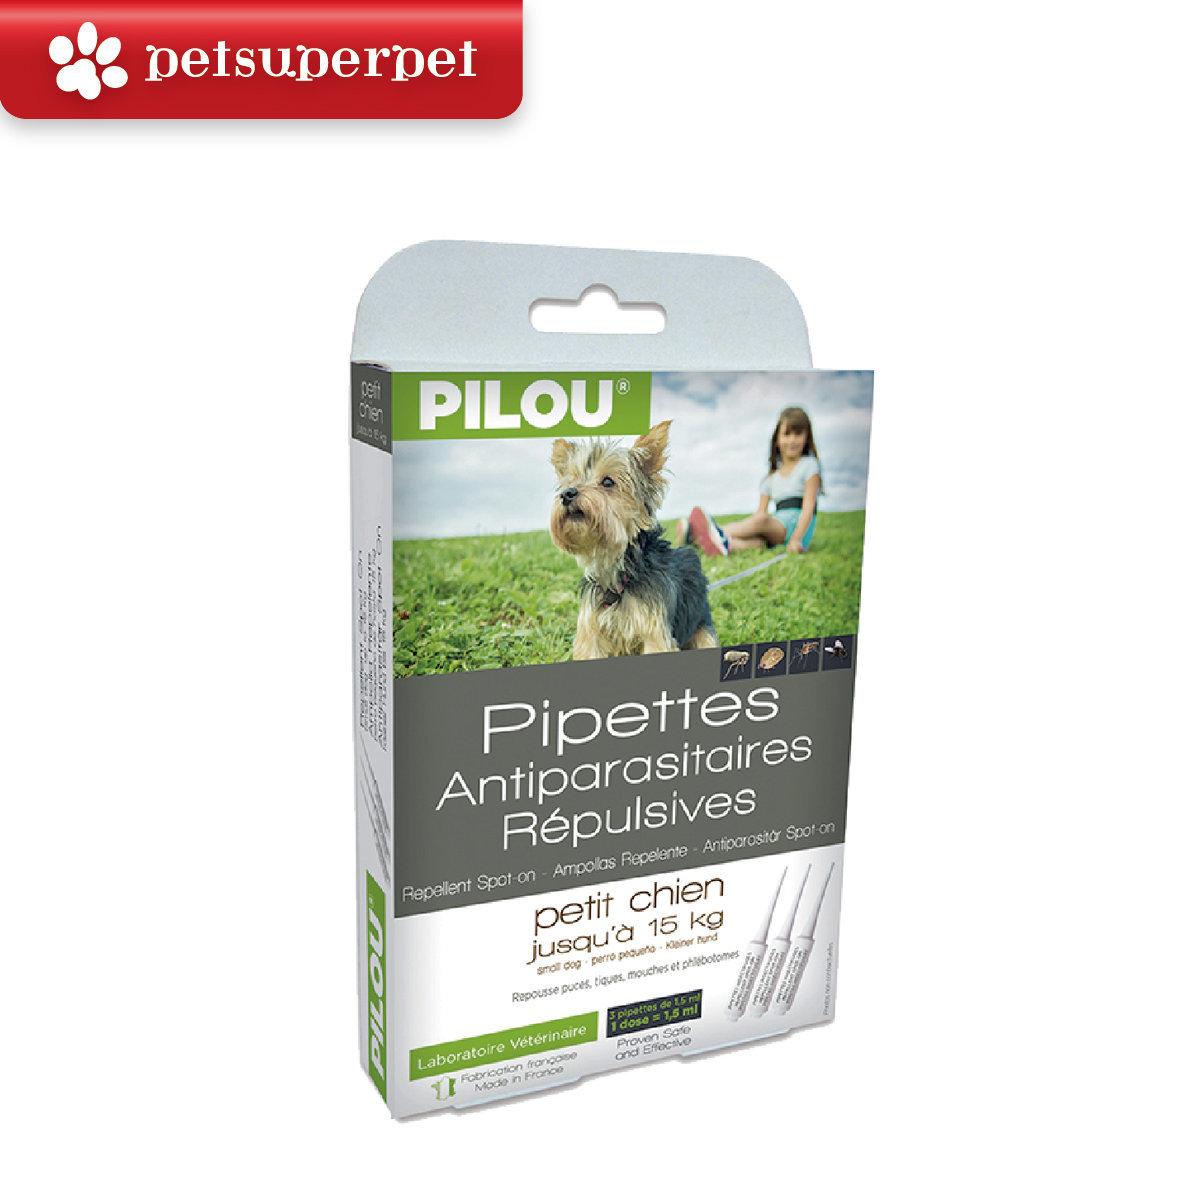 Repellent Spot-on below 15kg dogs (1.5ml X 3pcs)